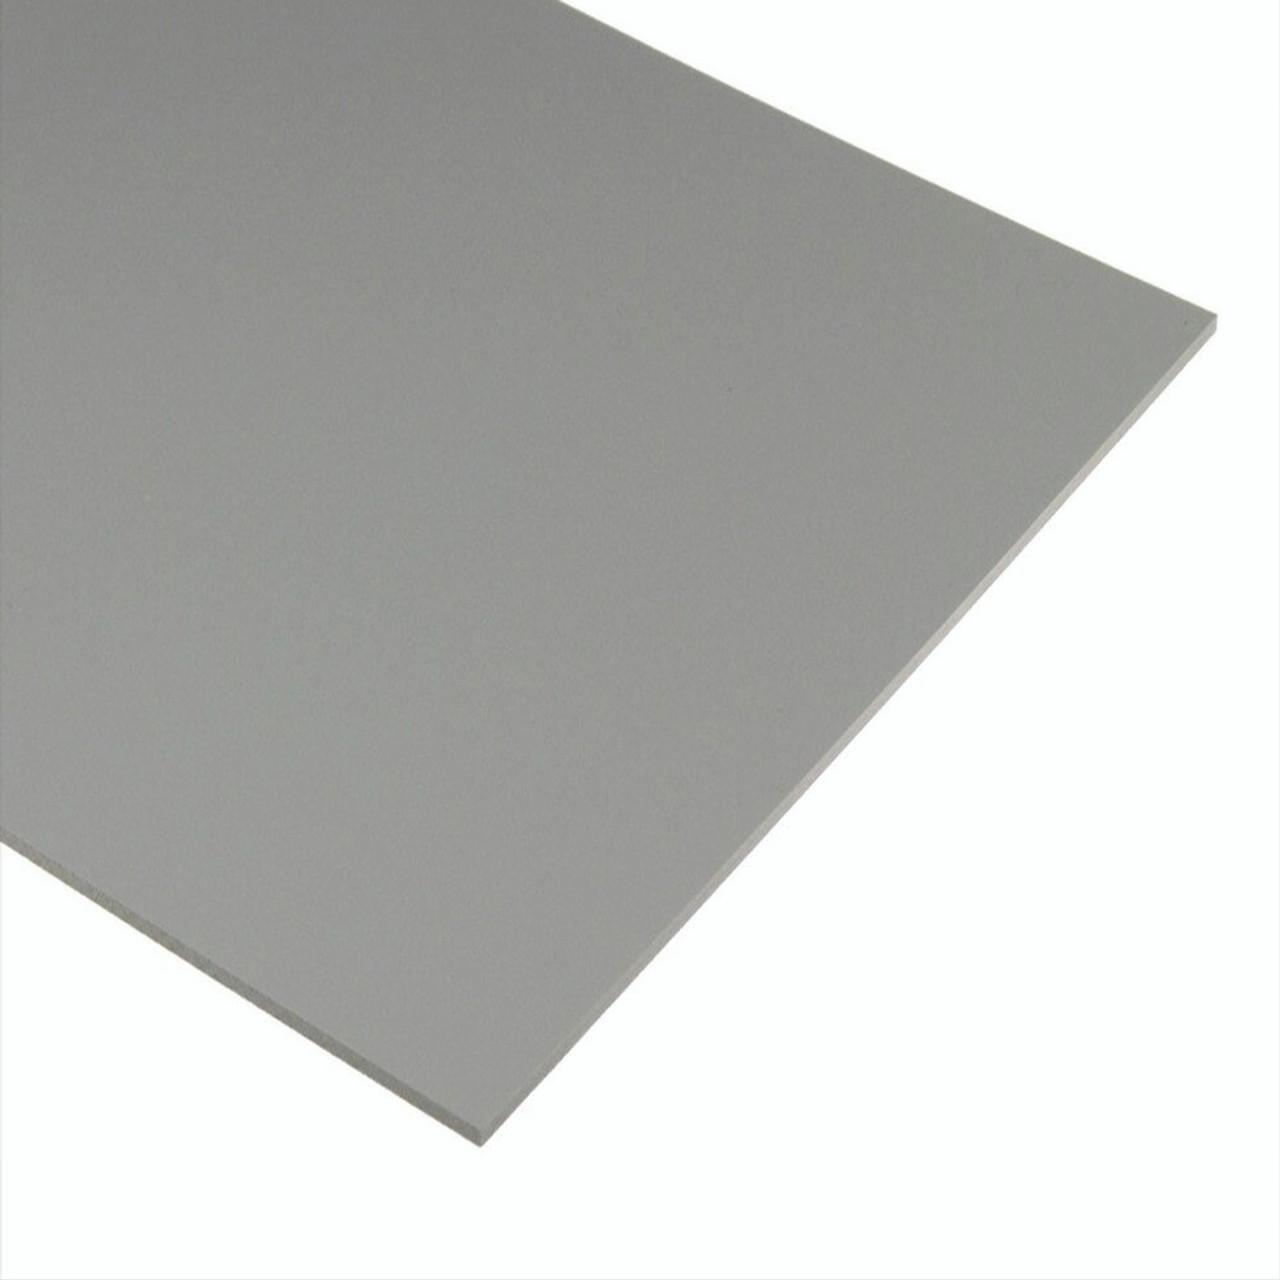 "4' x 8' x 1/4"" Grey Acrylic  2 sides Glossy, Plexiglas"